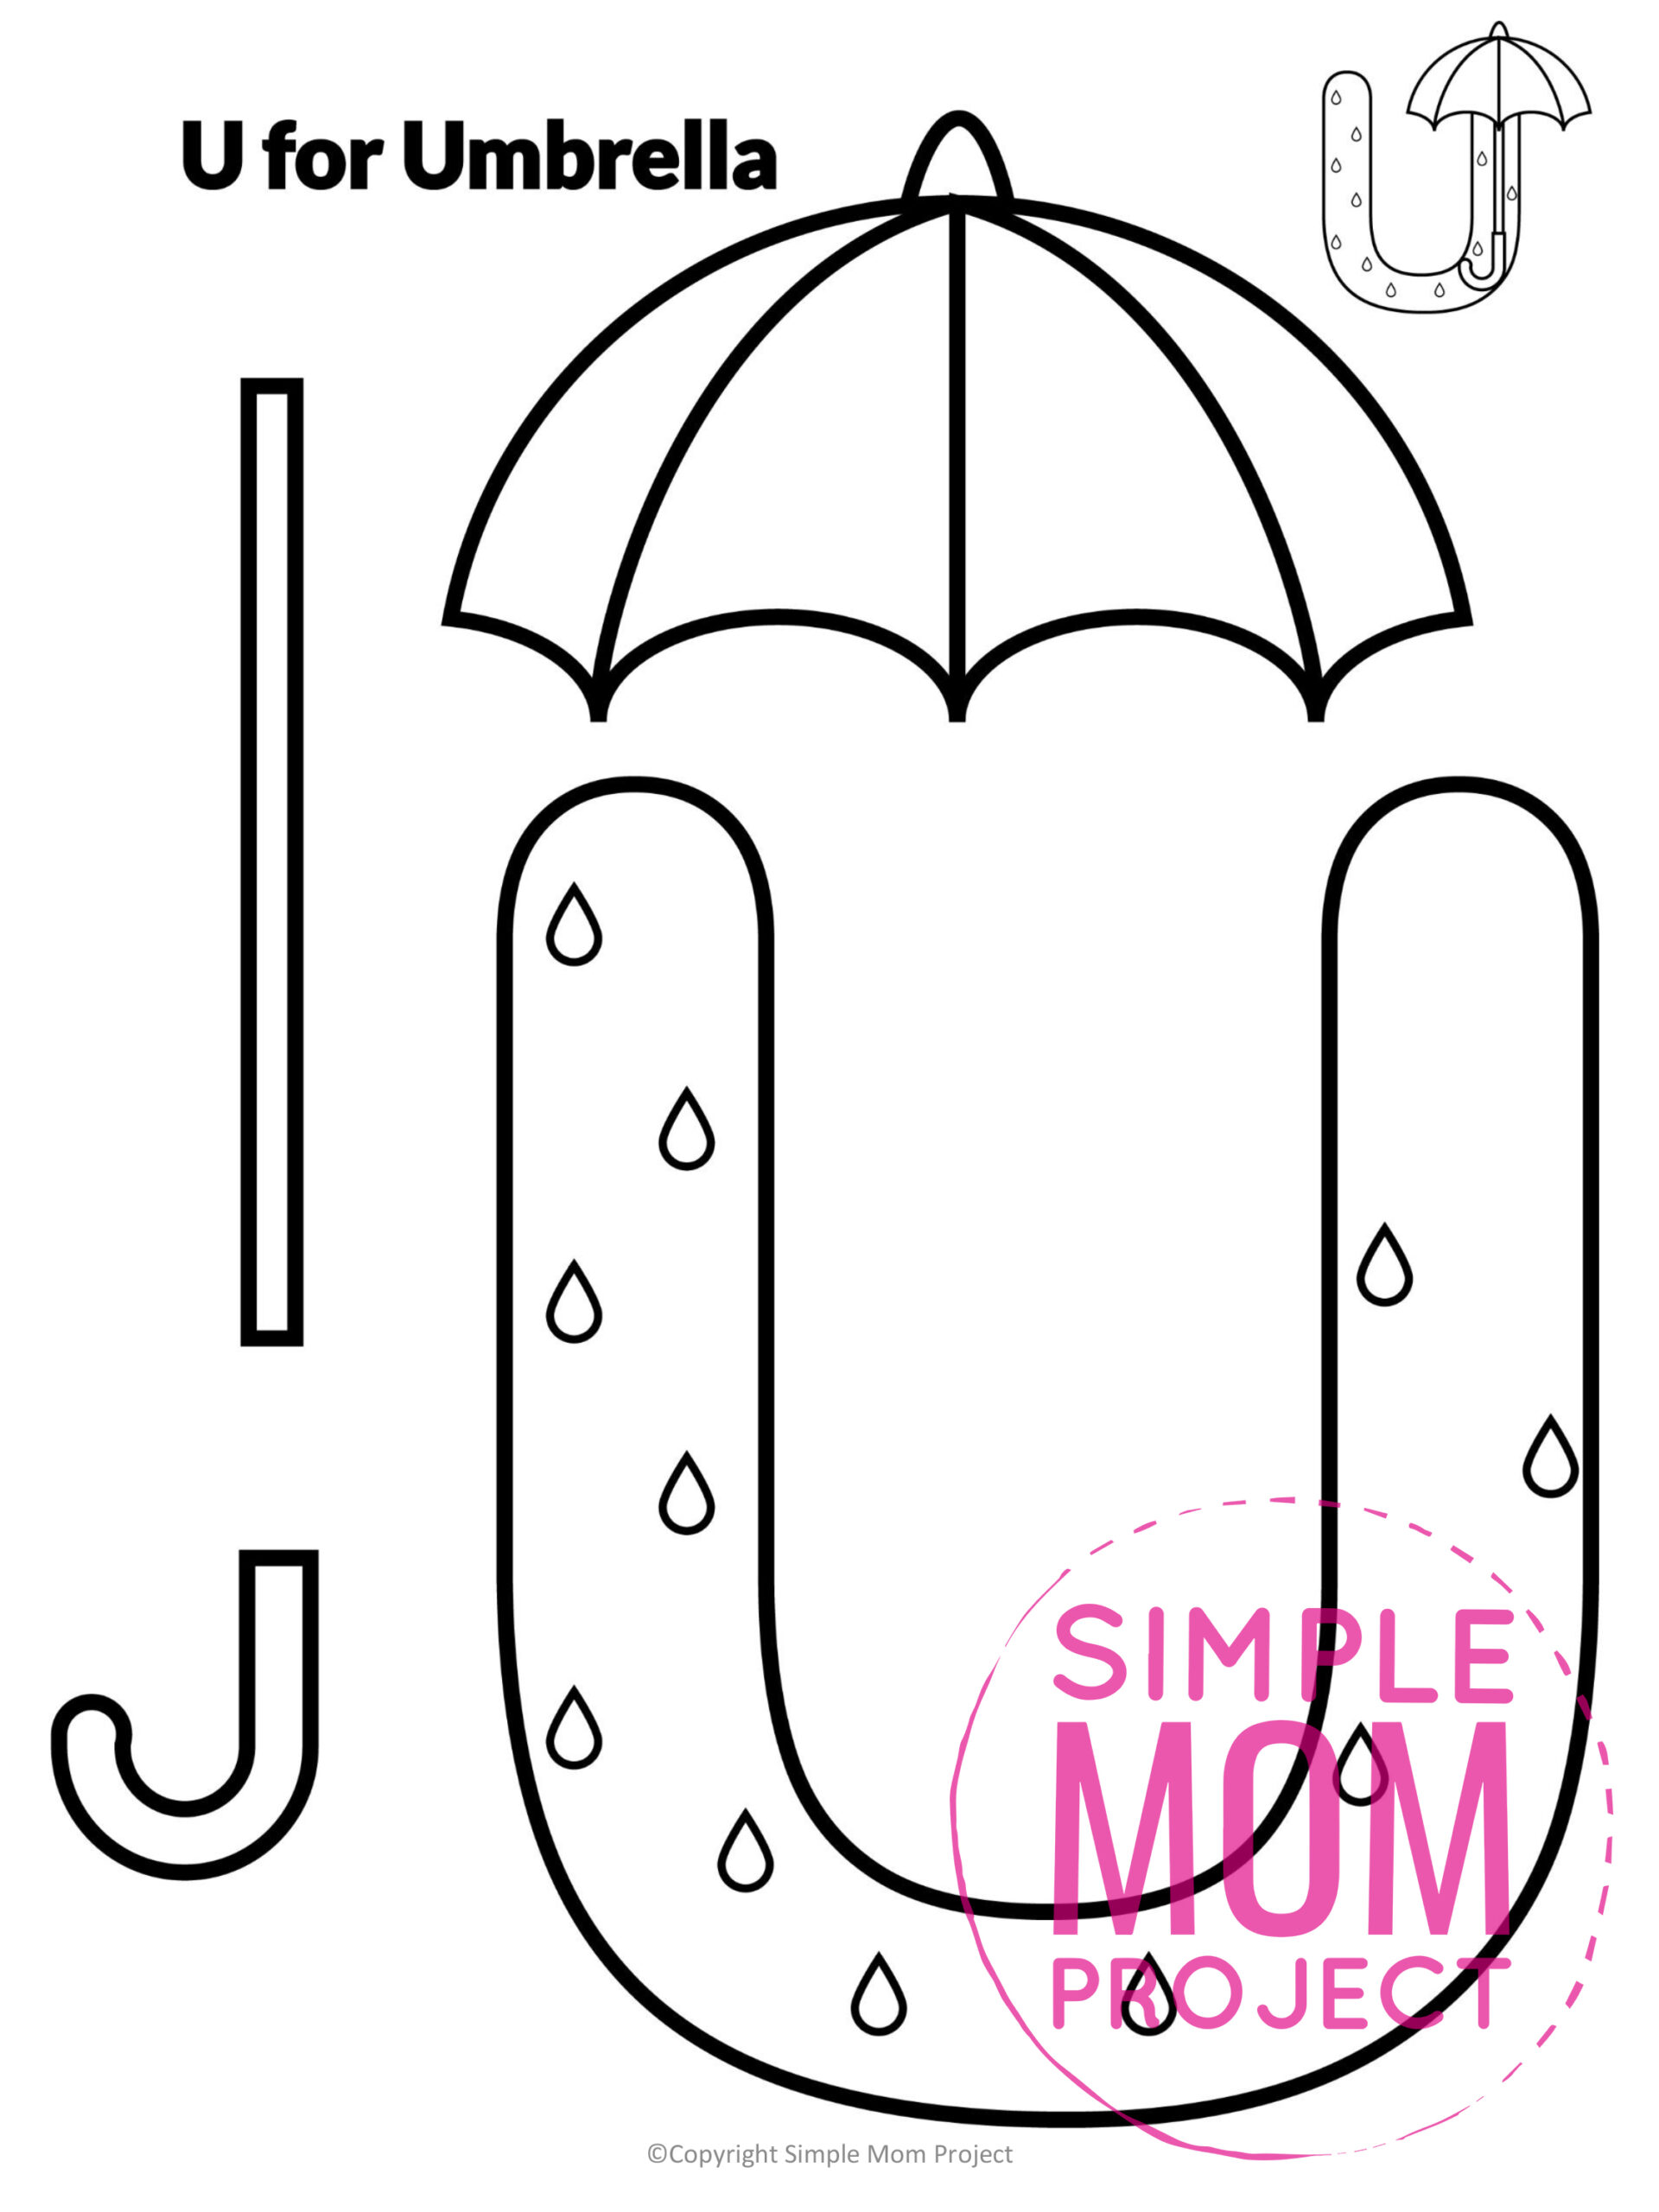 U is for Umbrella Printable Craft Umbrella Letter U Craft for Kids, preschoolers, toddlers and kindergartners